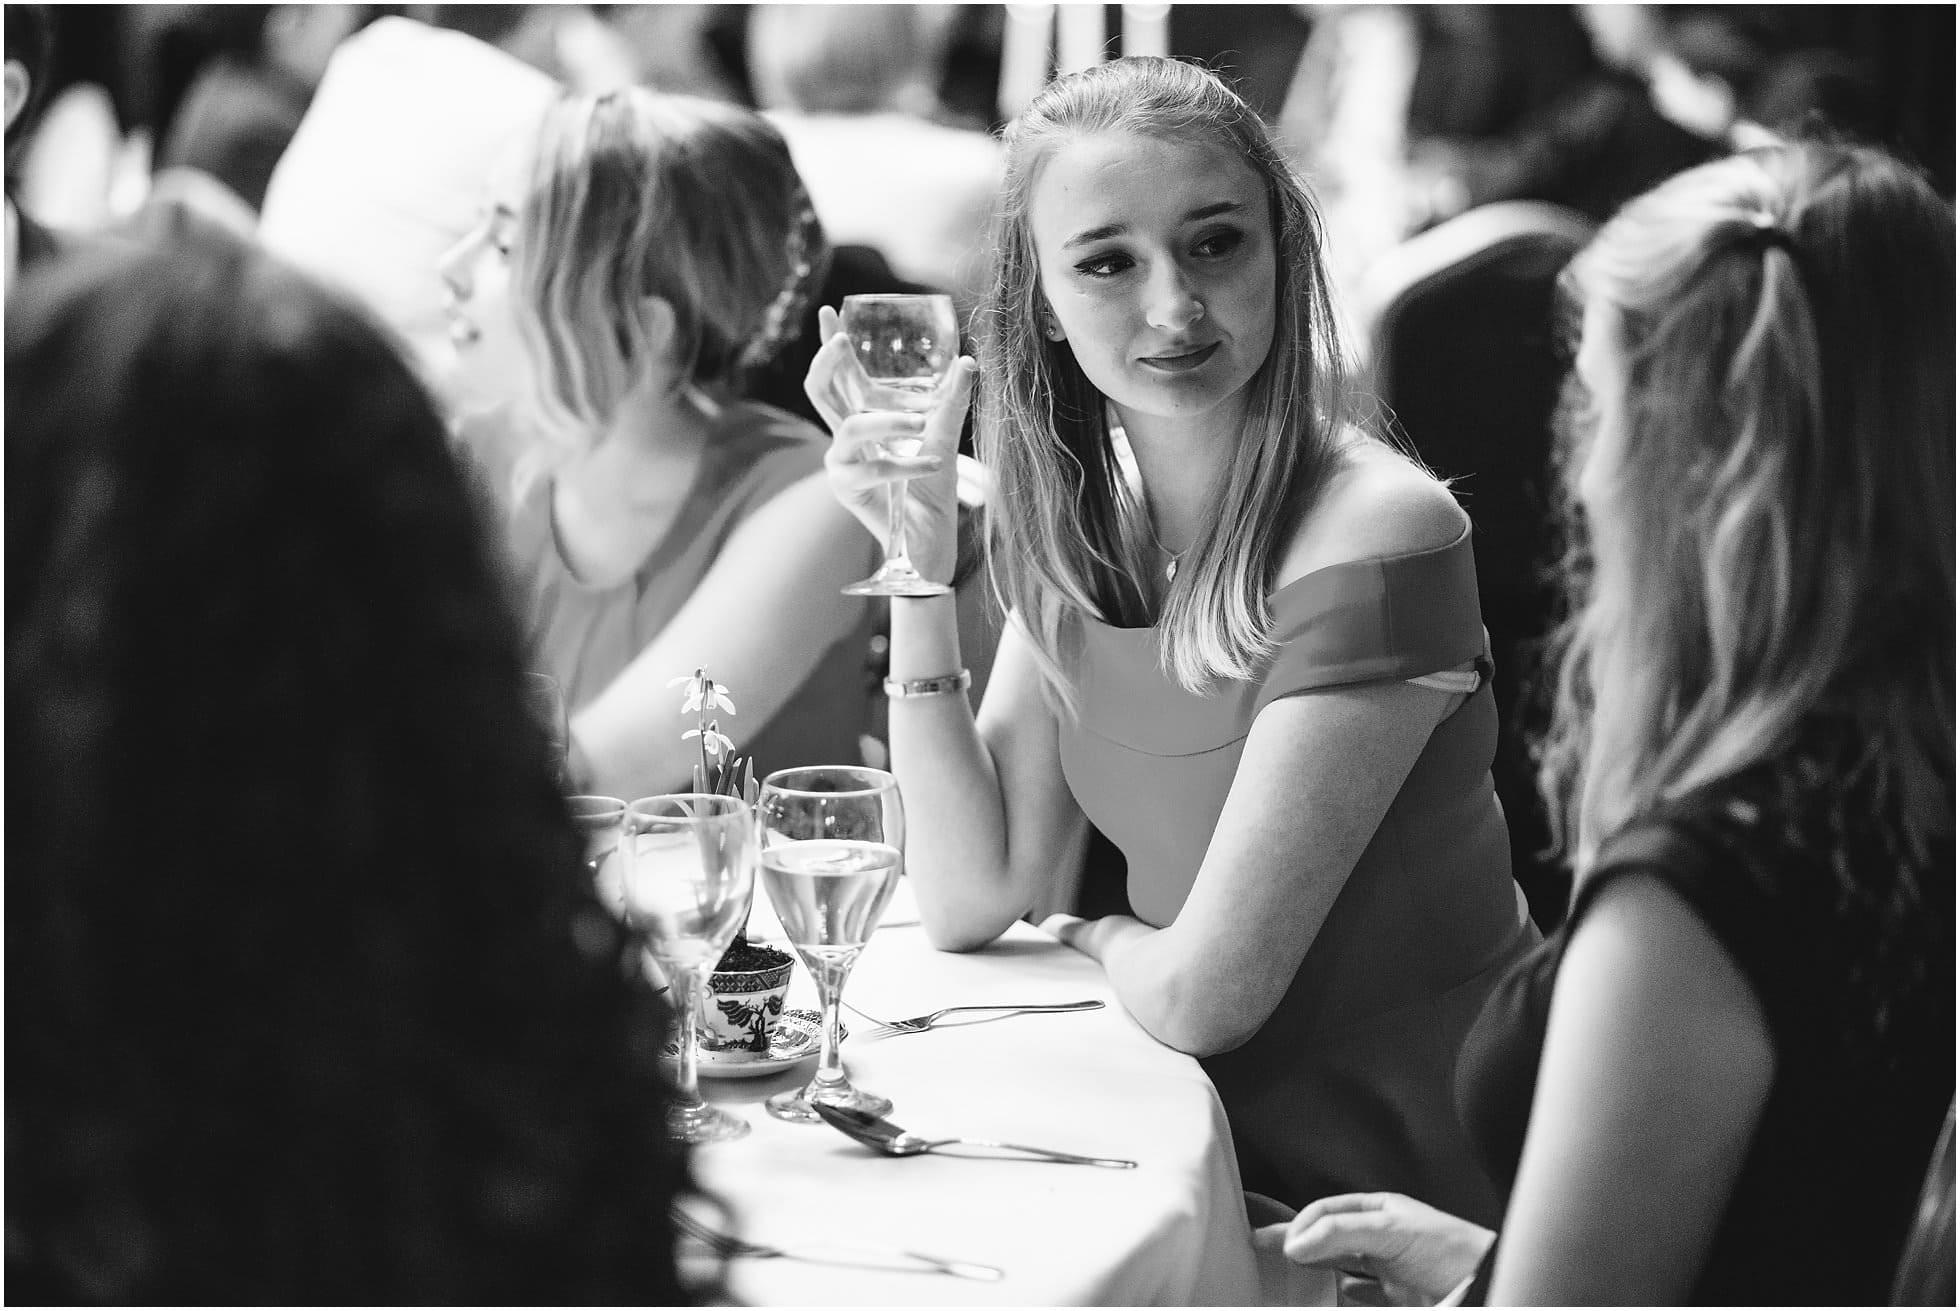 Guest enjoying her wine